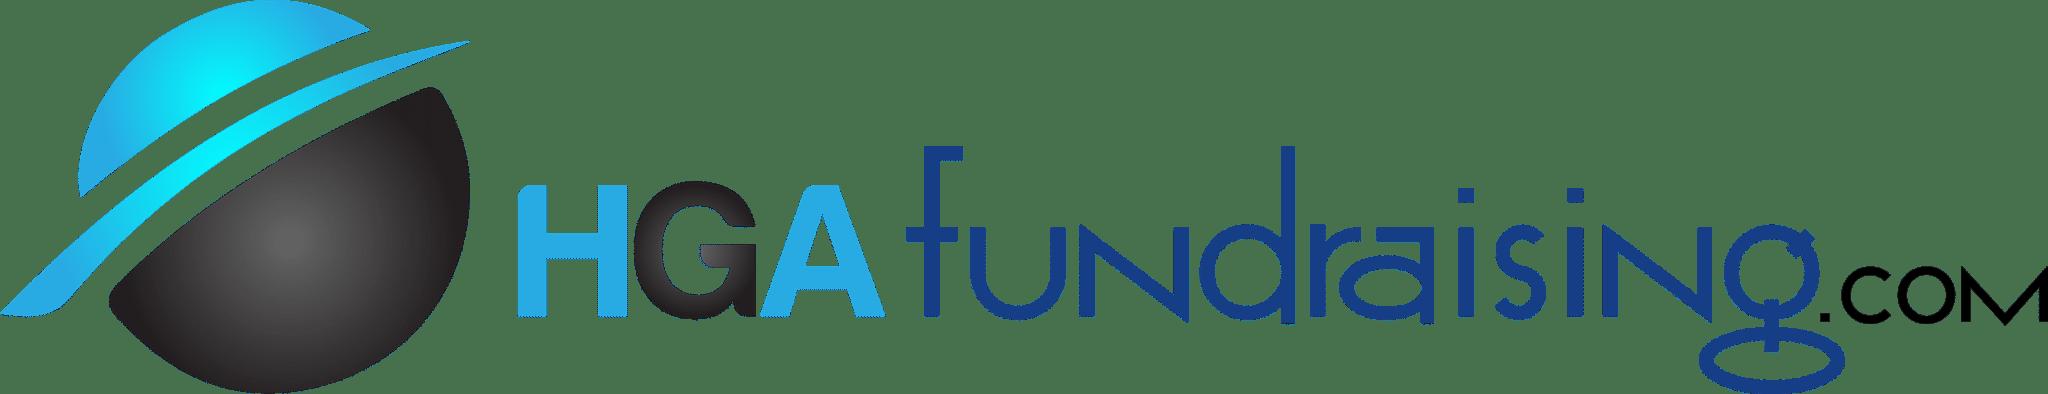 HGA Fundraising Logo